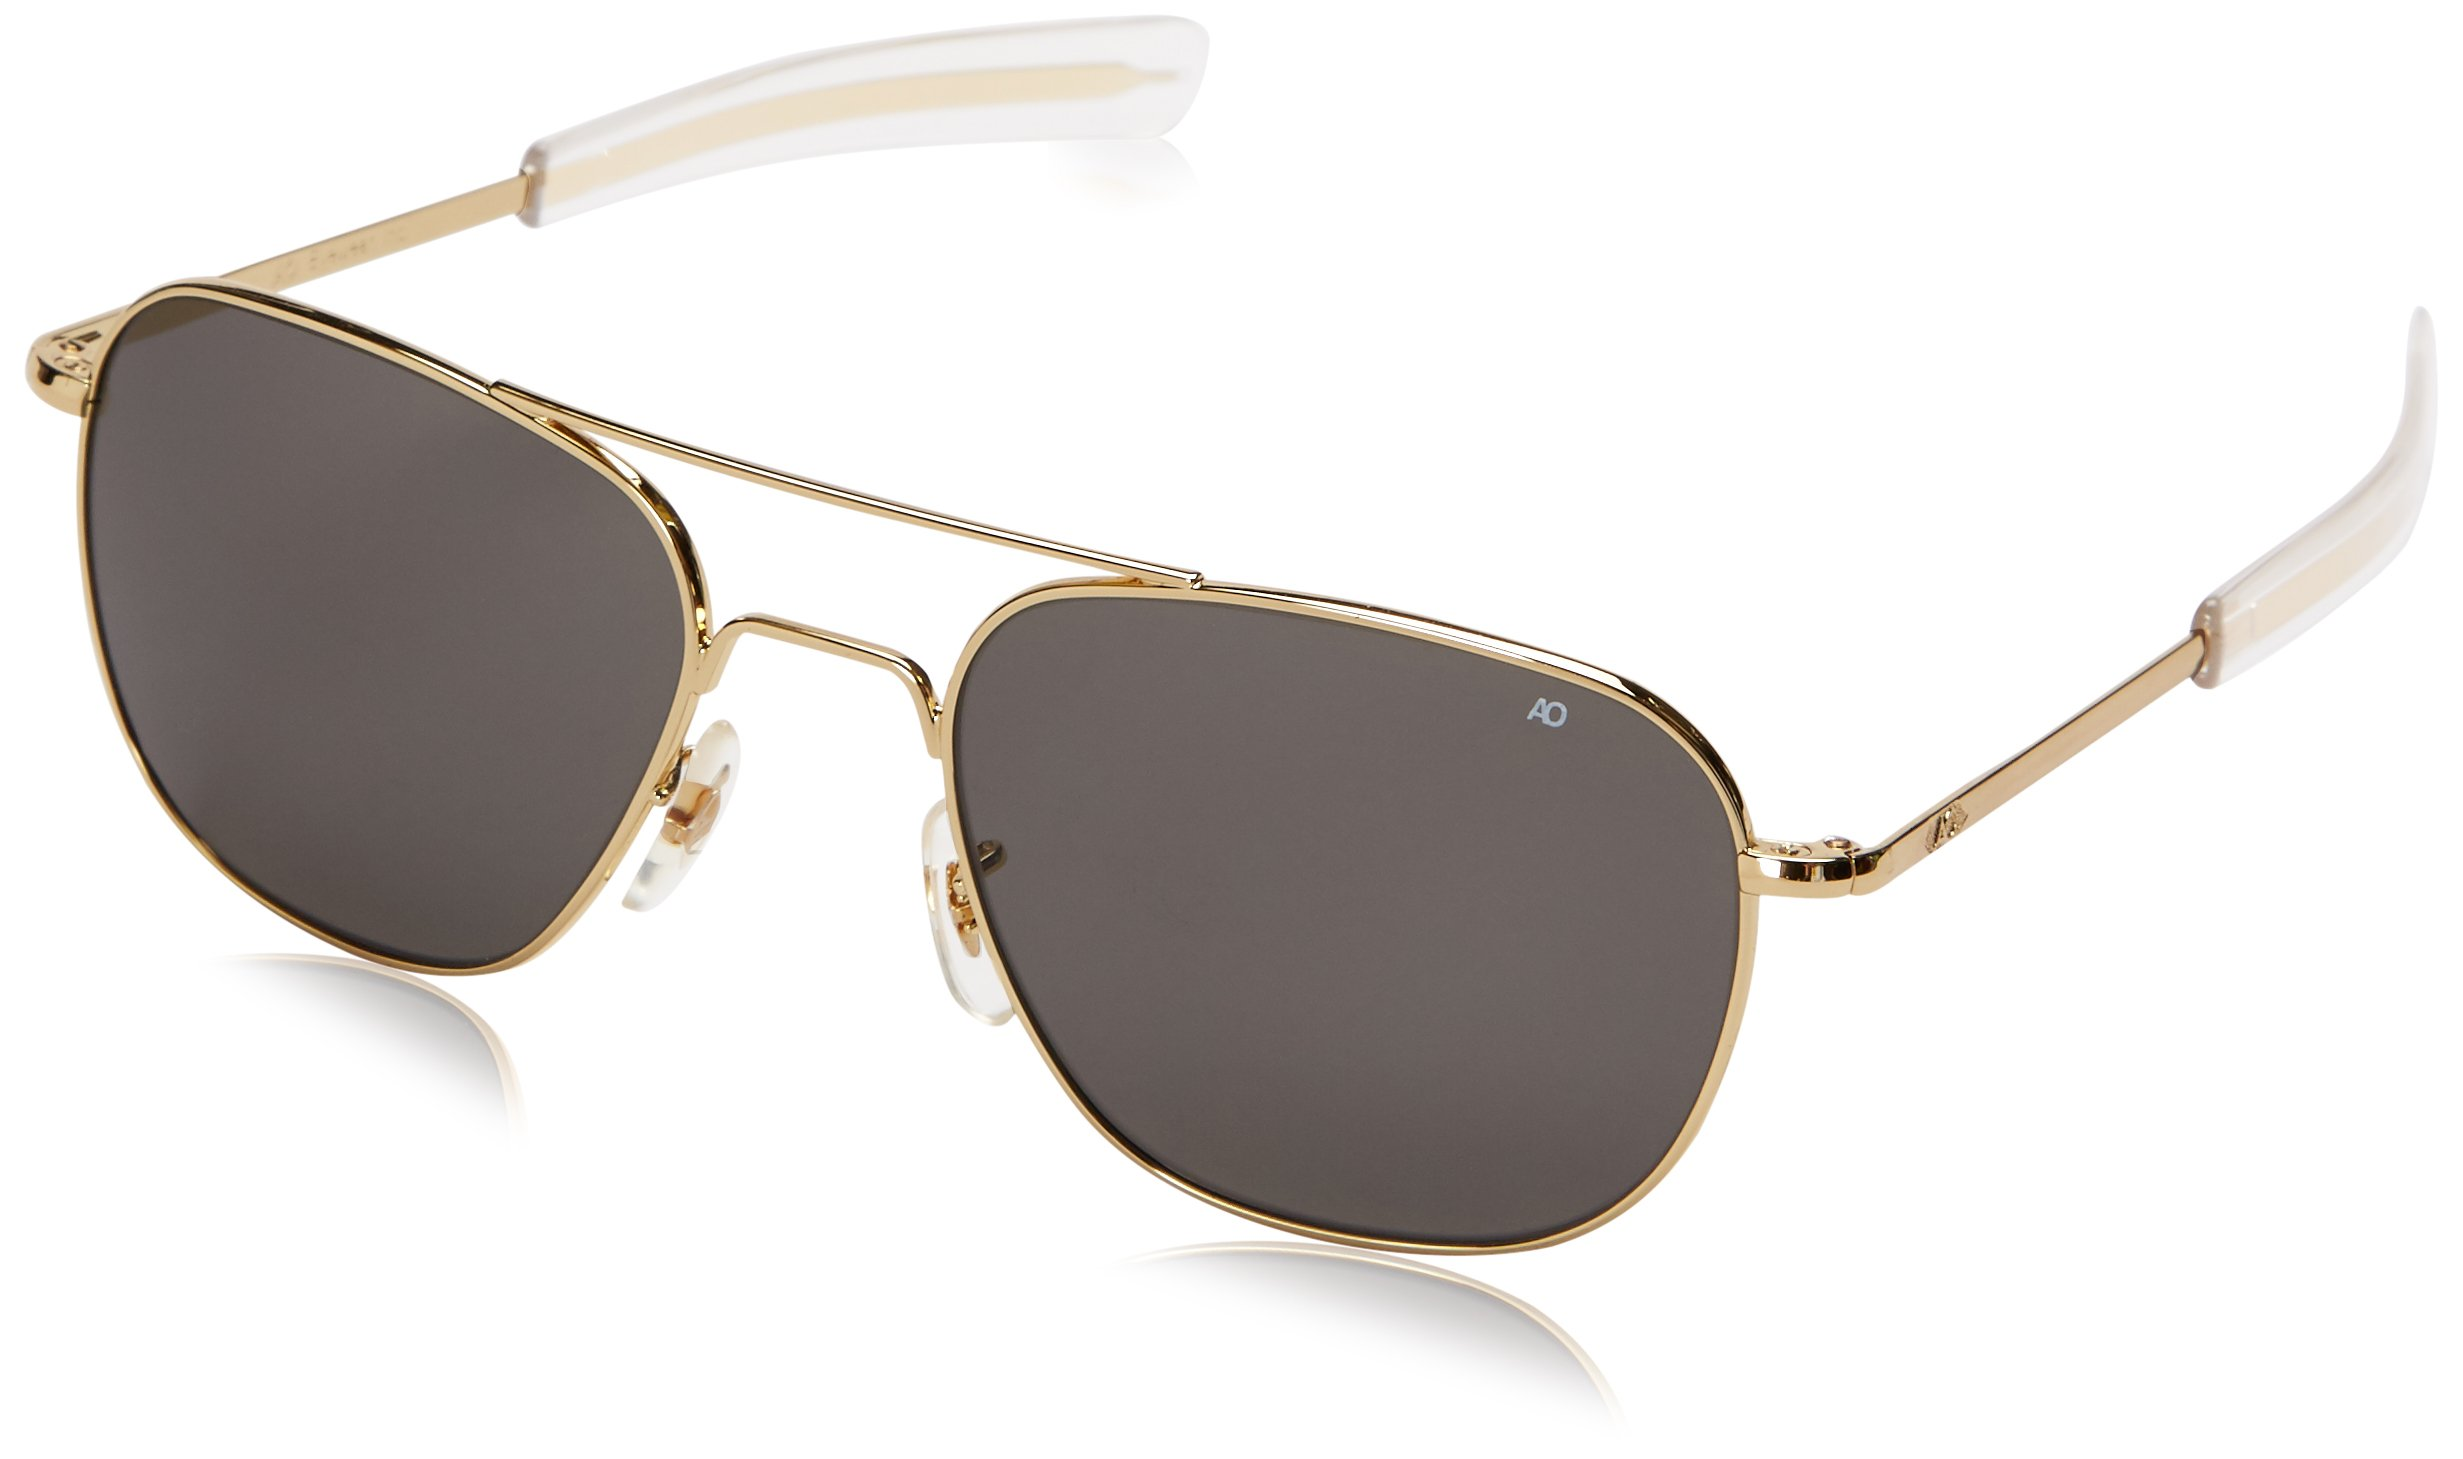 AO Eyewear American Optical - Original Pilot Aviator Sunglasses with Bayonet Temple and Gold Frame, True Color Grey Glass Lens